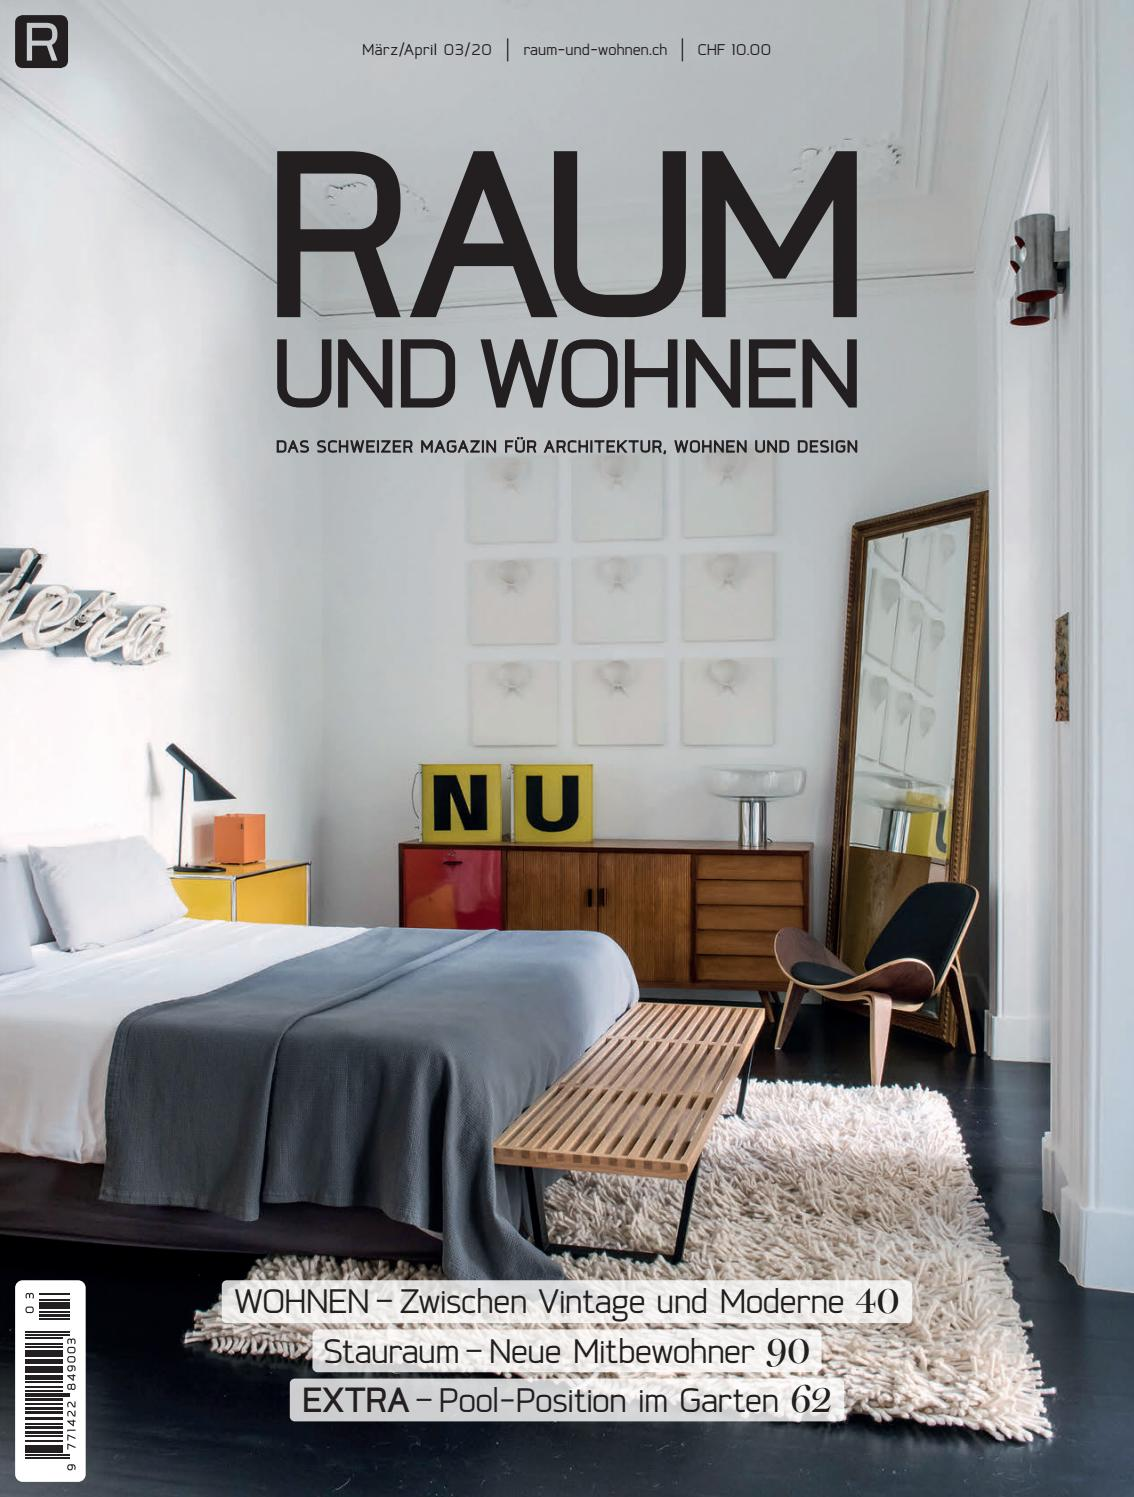 Full Size of Paravent Balkon Bauhaus Raum Und Wohnen By Blickfang Fenster Garten Wohnzimmer Paravent Balkon Bauhaus